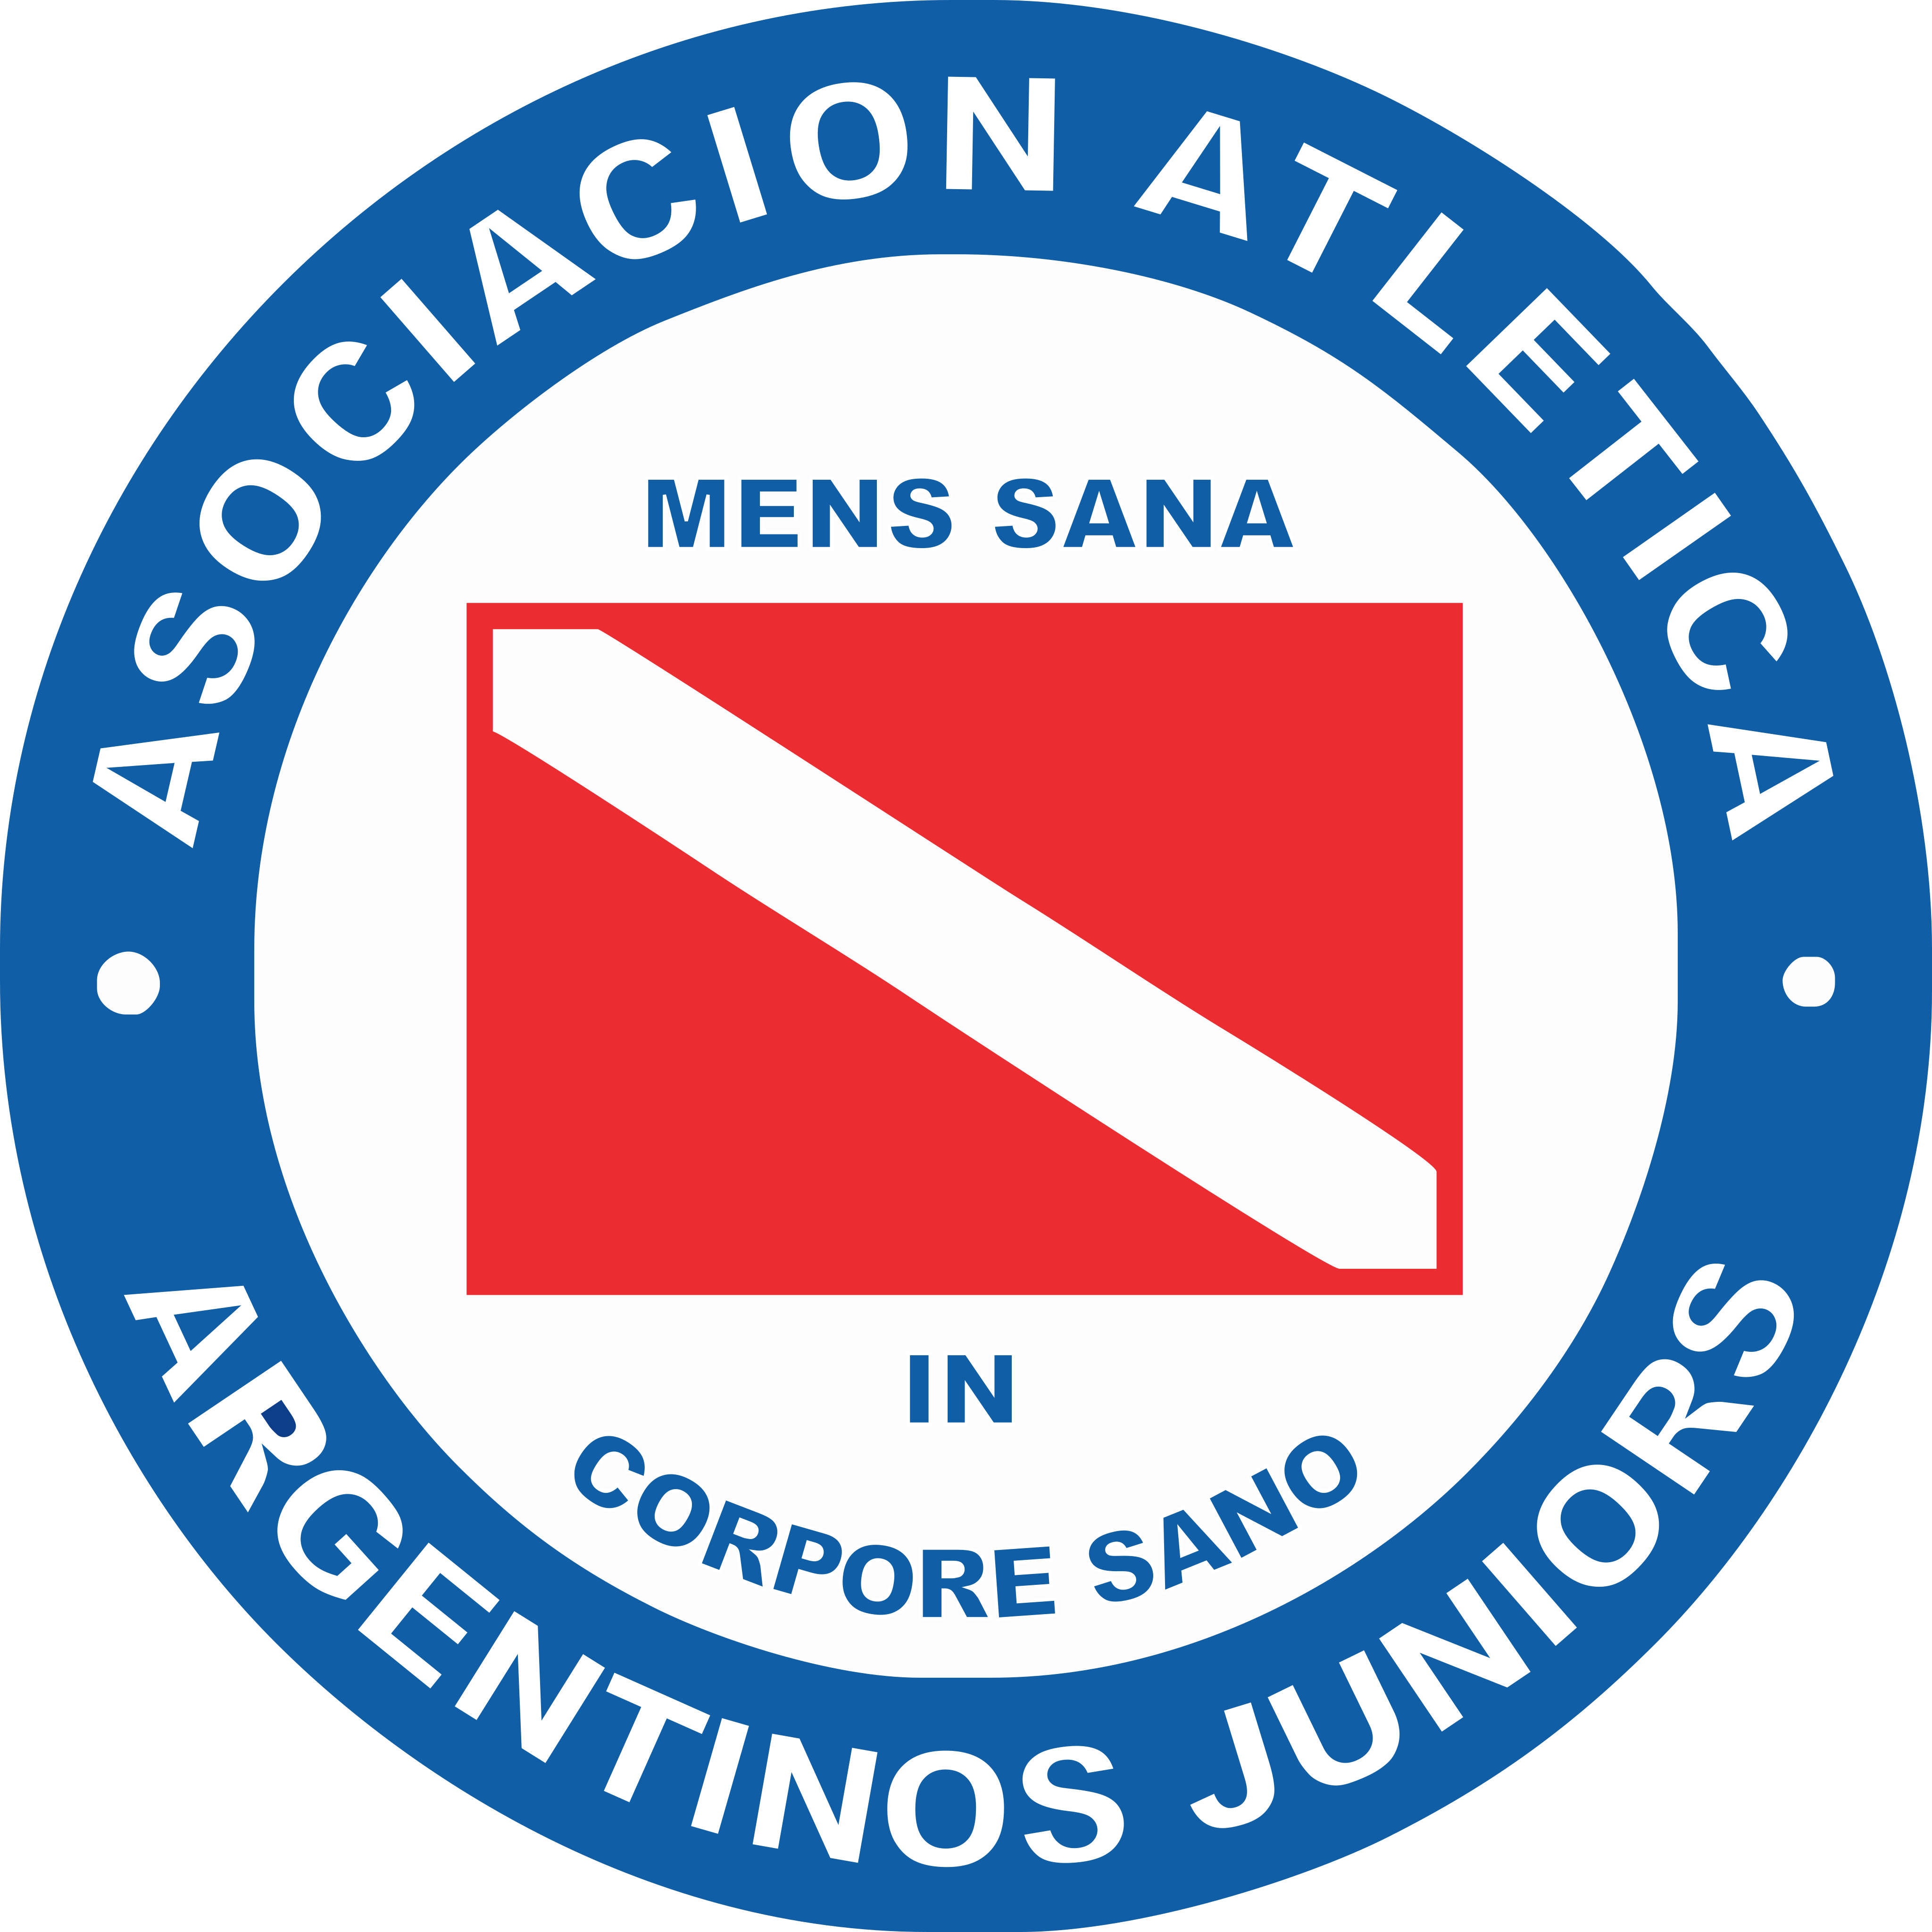 argentinos juniors logo - Argentinos Juniors Logo